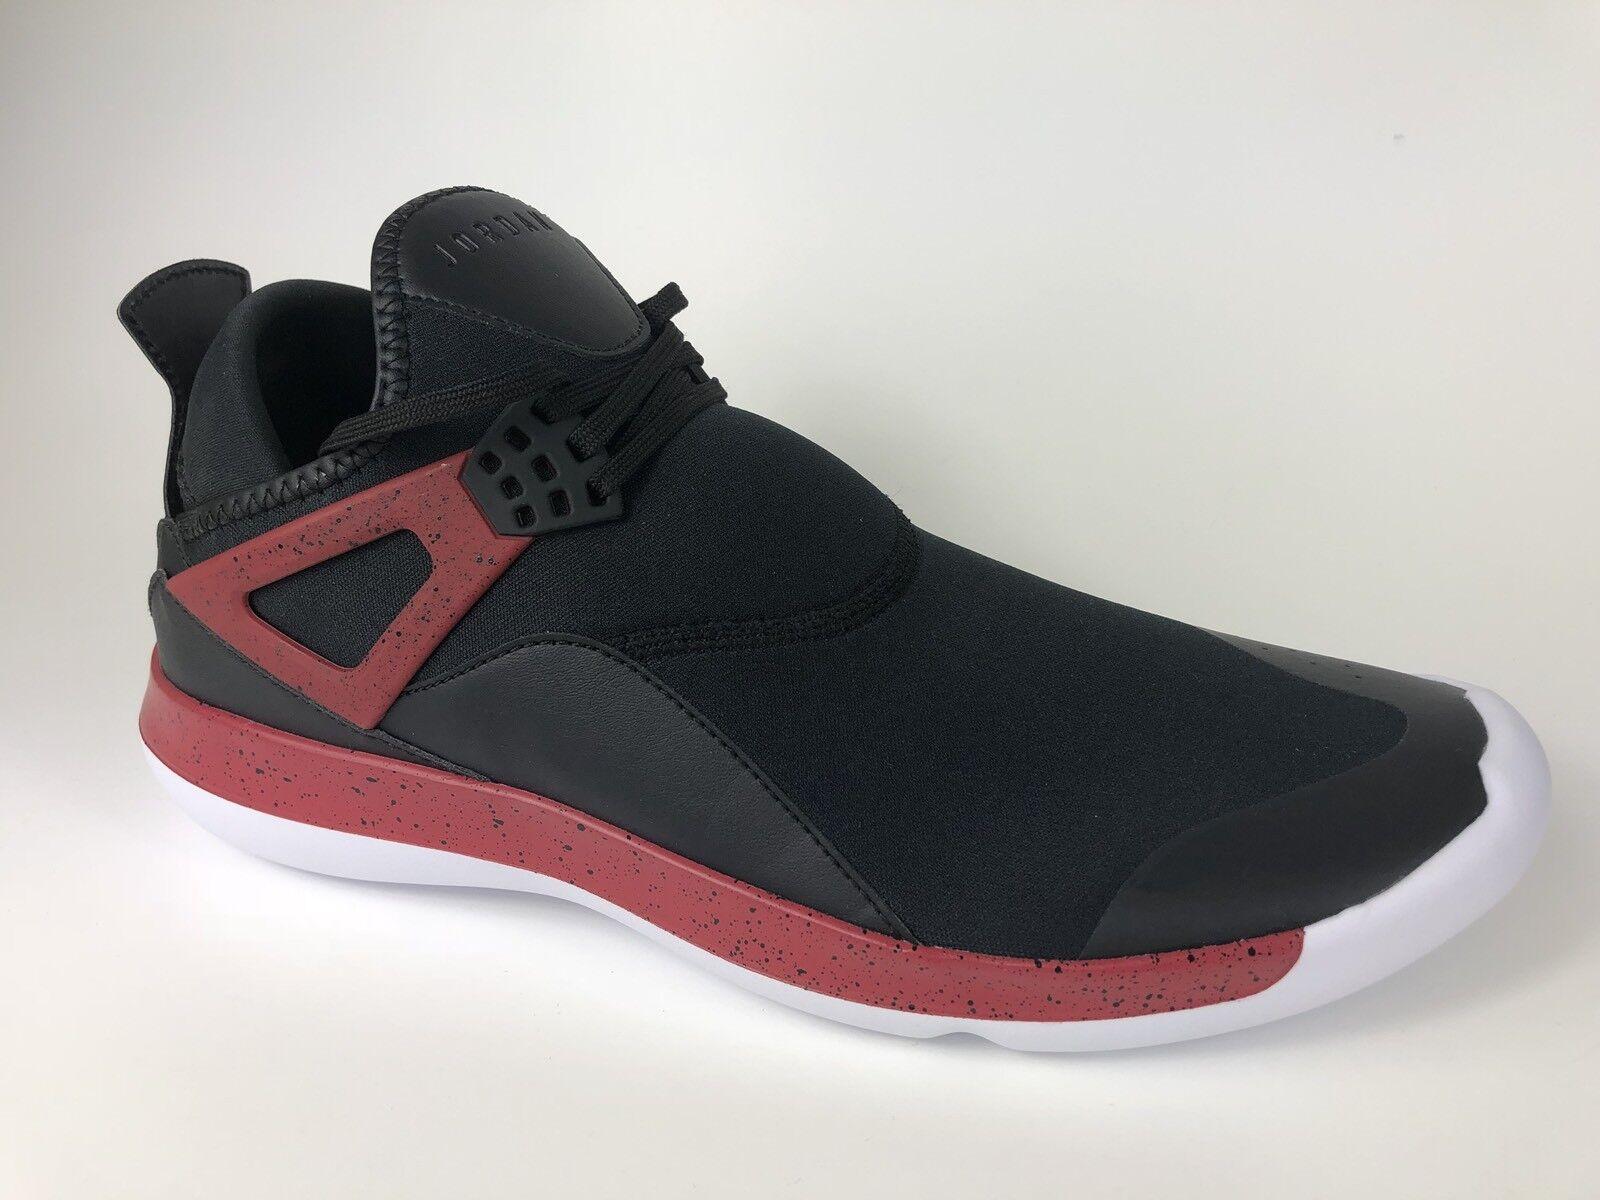 Nike Jordan Fly 89 Men's Sneakers Sz 11 Sports shoes 940267-002 Gym Red